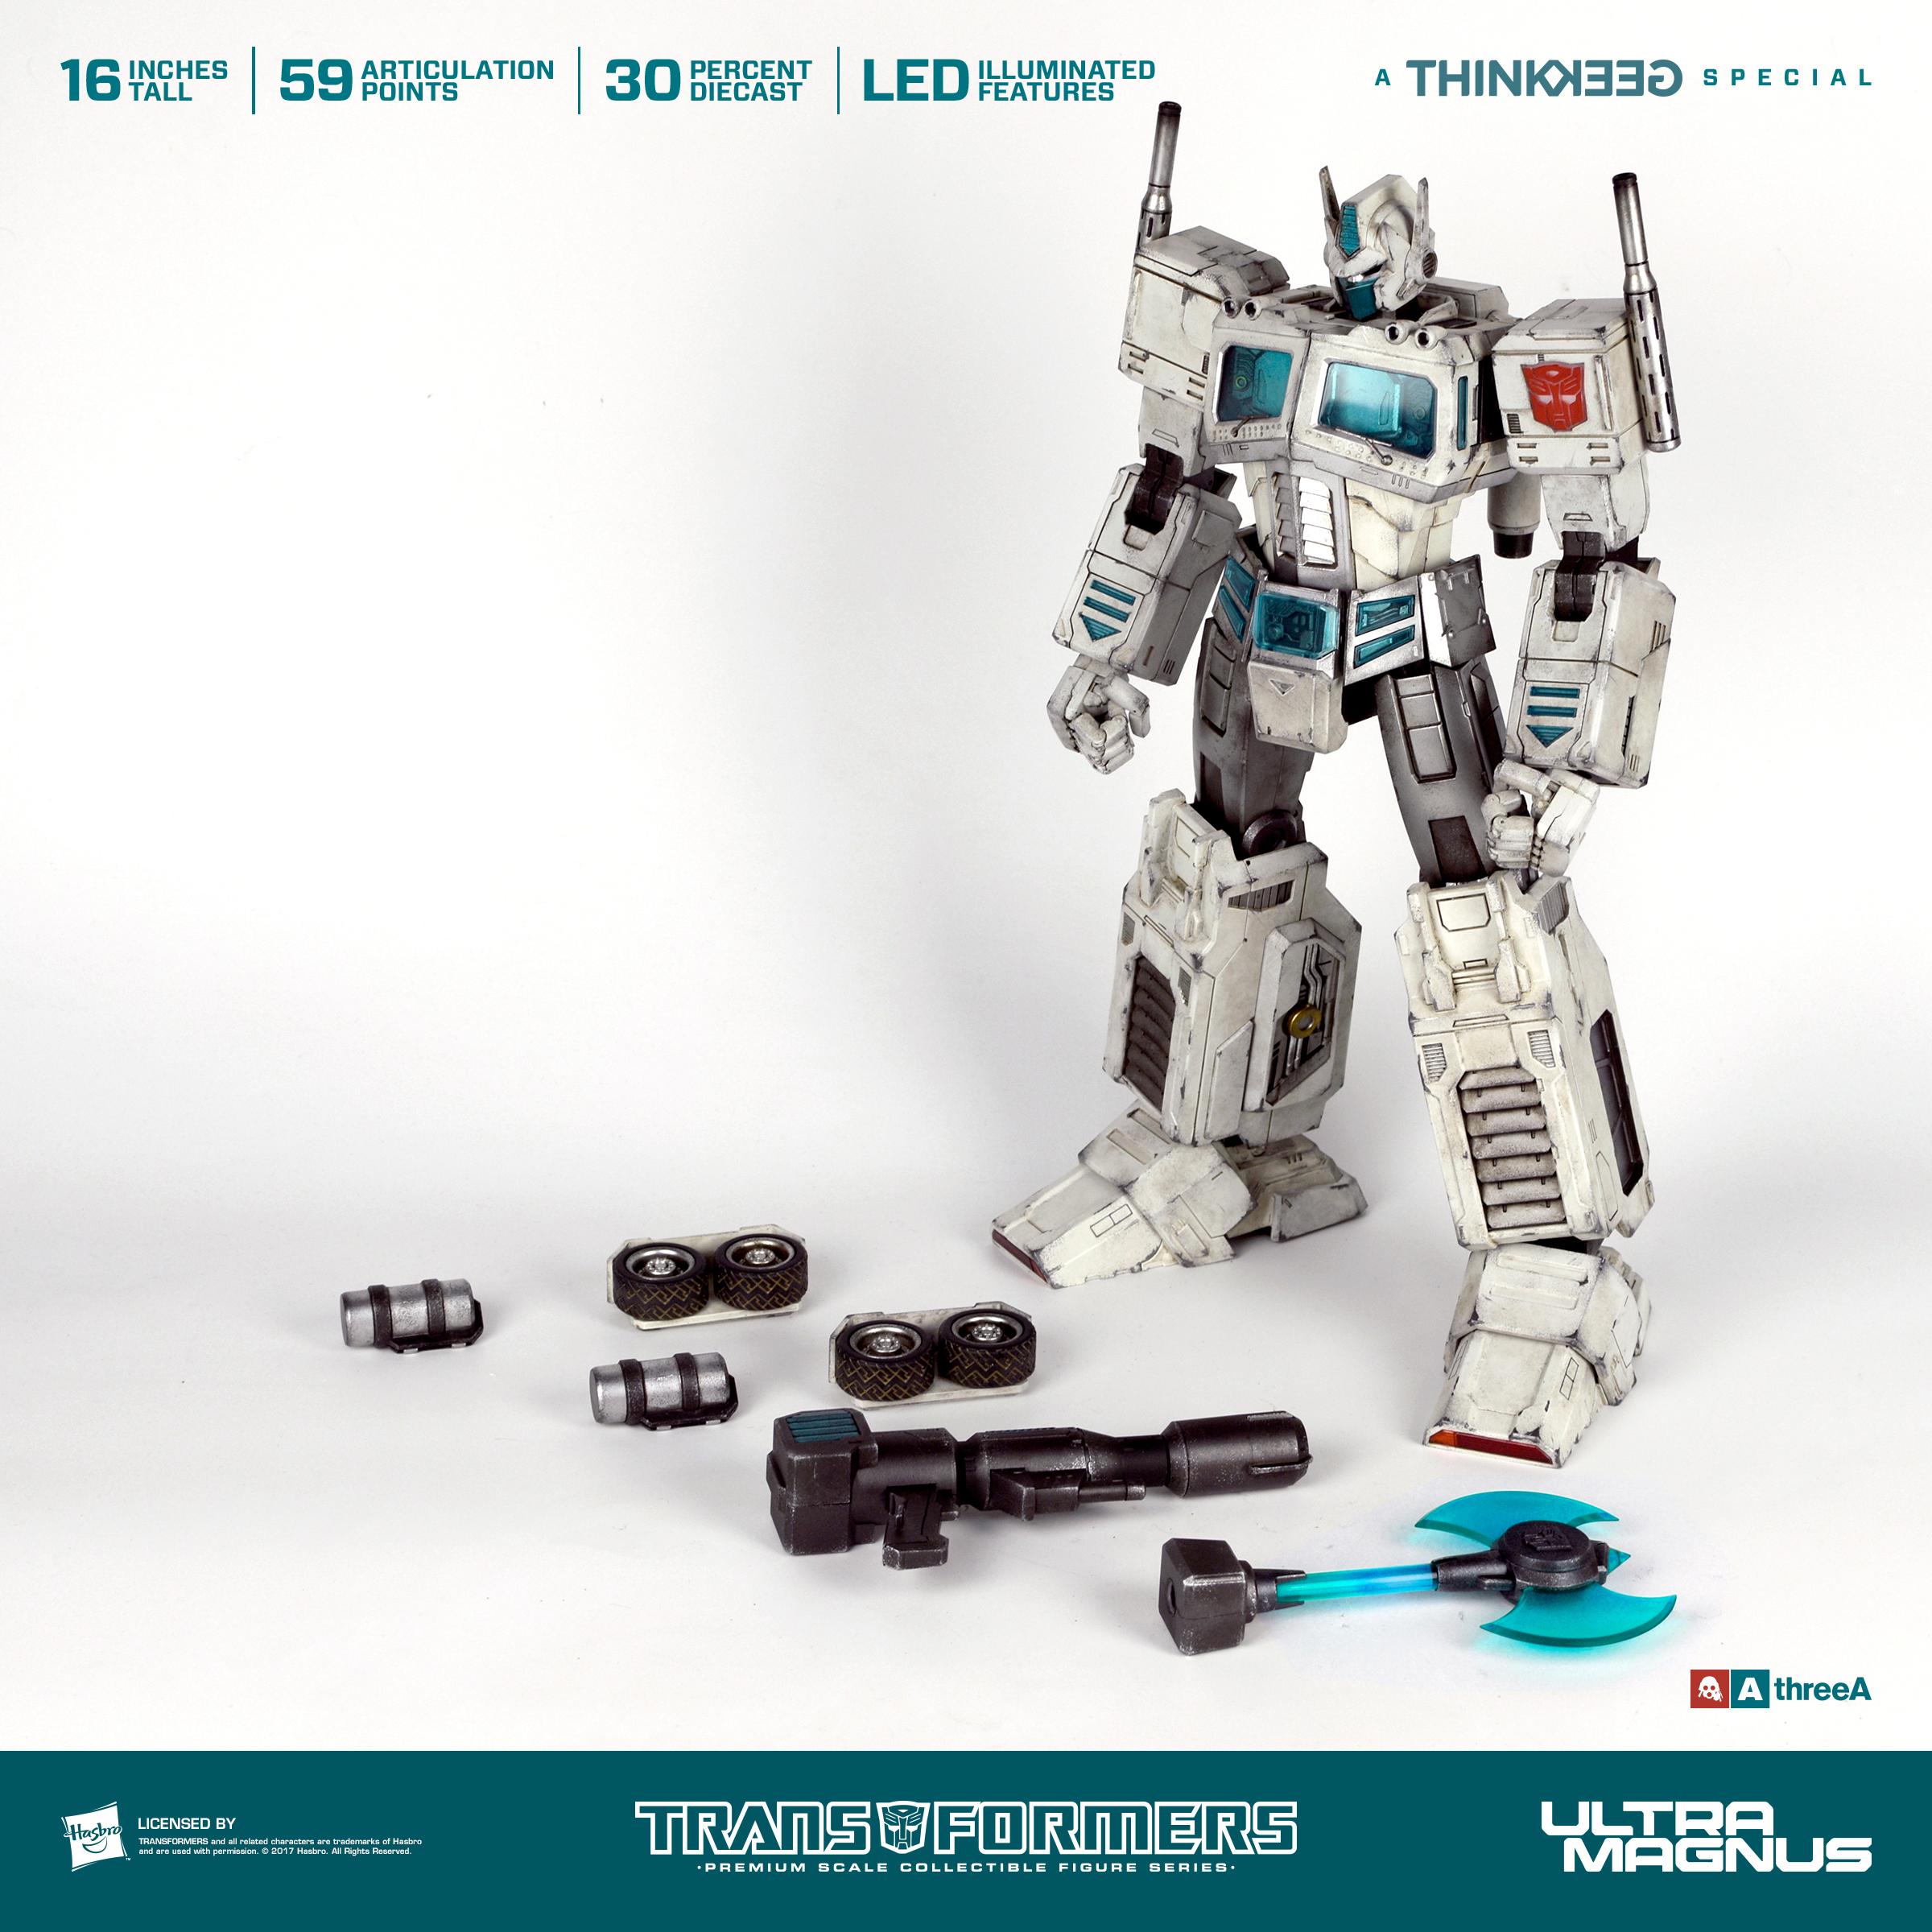 3A_Transformers_G1_UltraMagnus_RetailImages_2400x2400_003.jpg